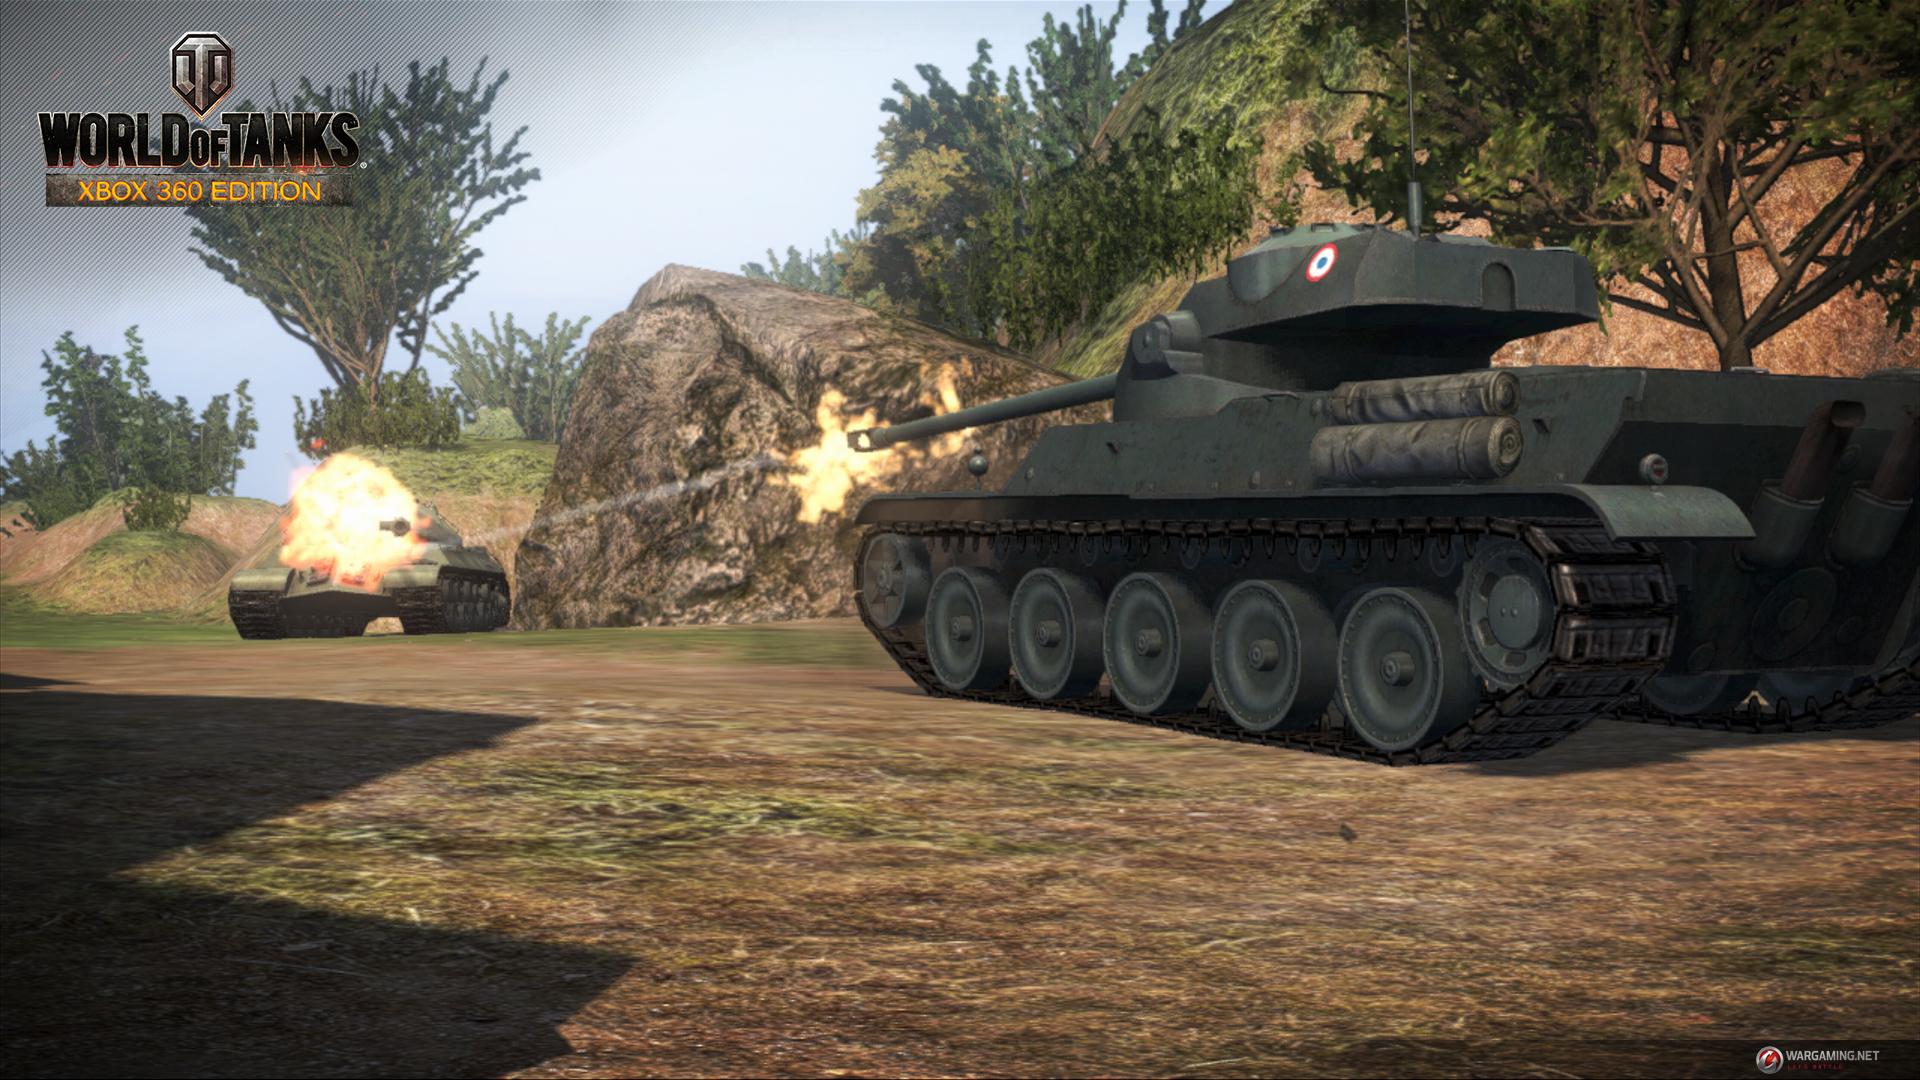 WoT_Xbox_360_Edition_Screens_Vive_la_France_Update_Image_02